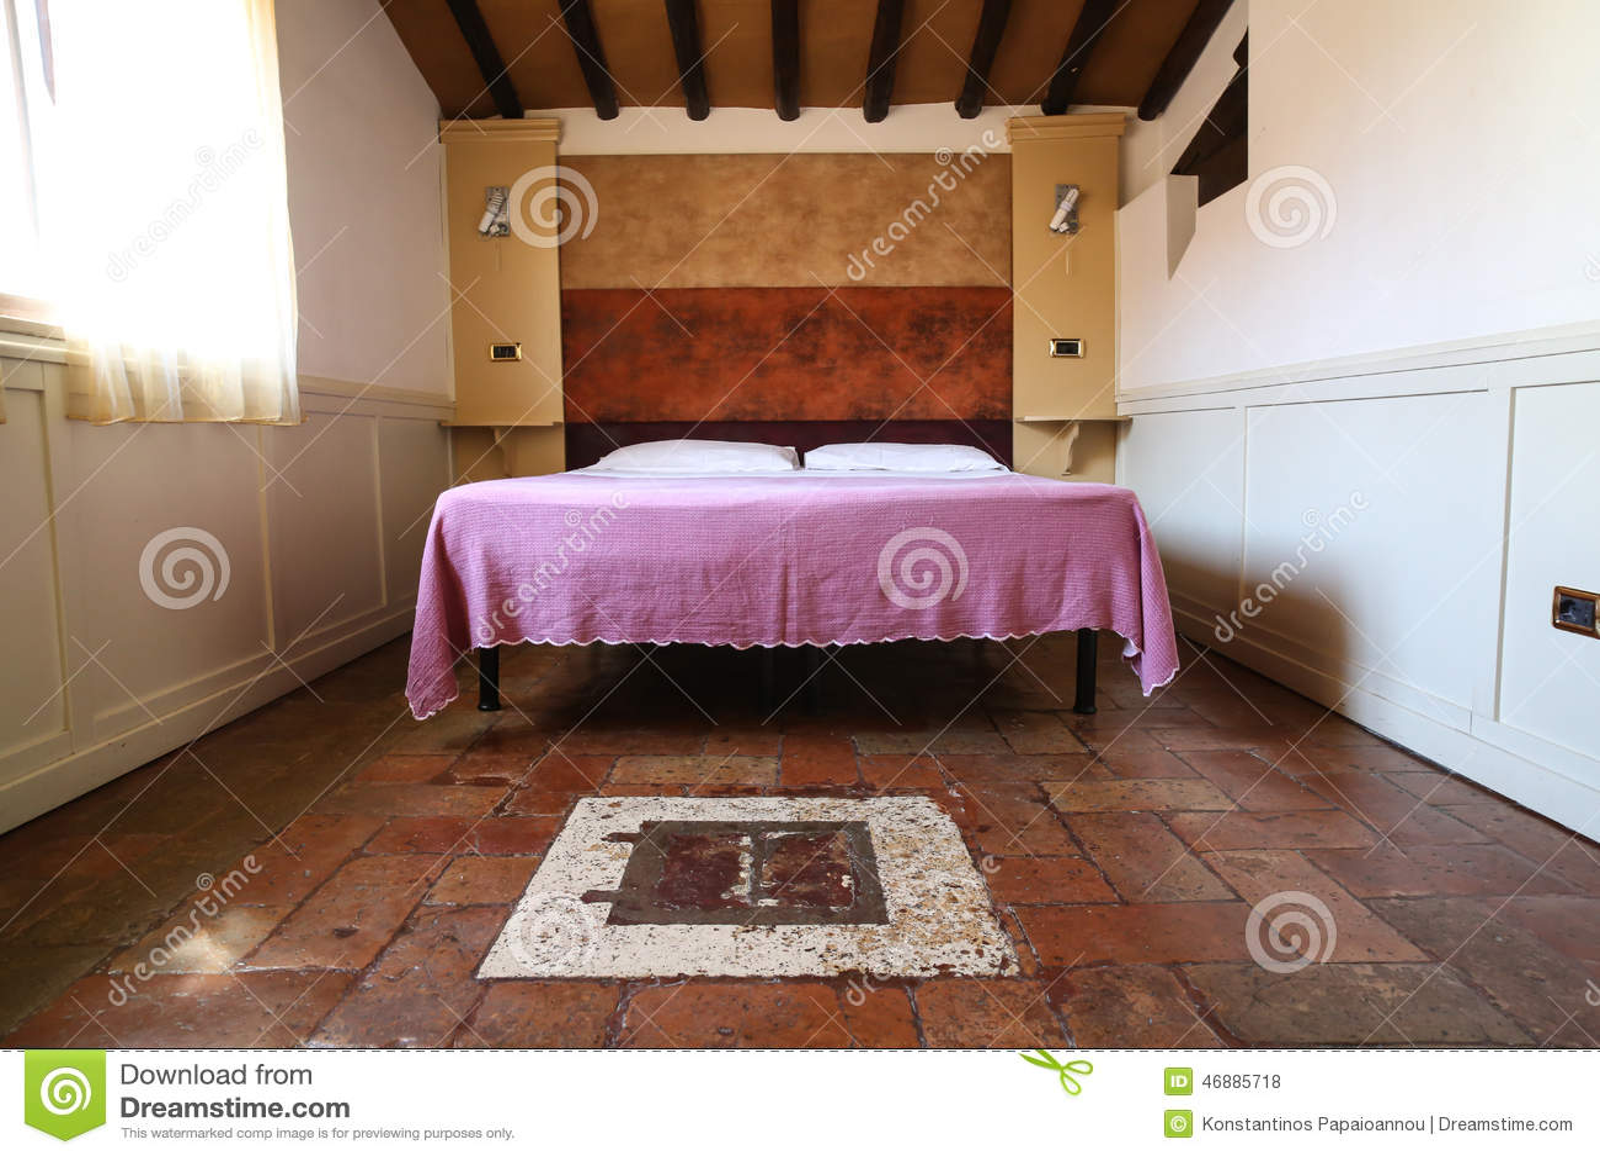 Elegant bedroom stock photo image of lifestyles for Rustic elegant bedroom designs